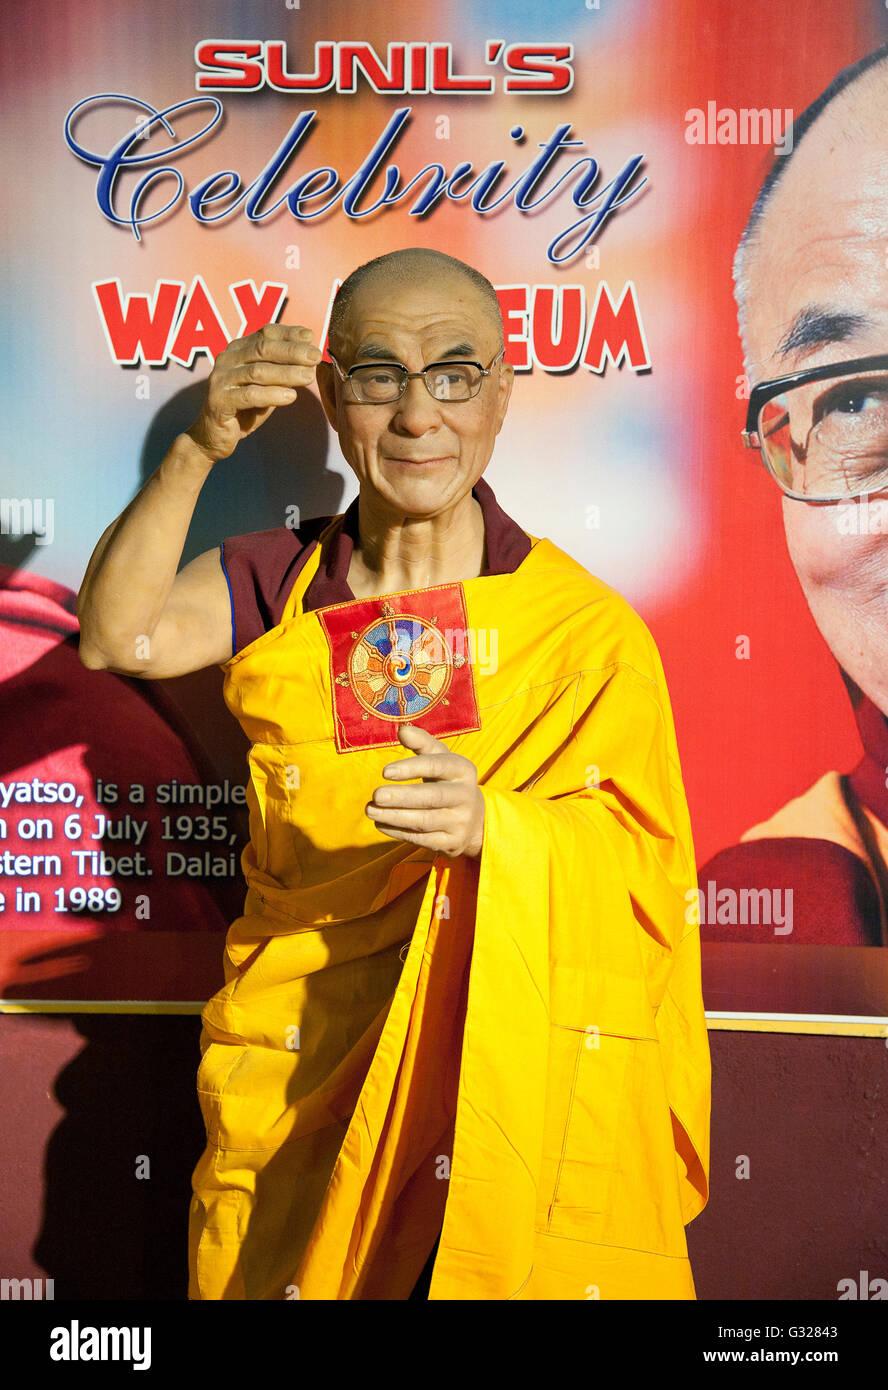 The image of Dalai Lama wax statue in Lonavala wax Museum, India - Stock Image